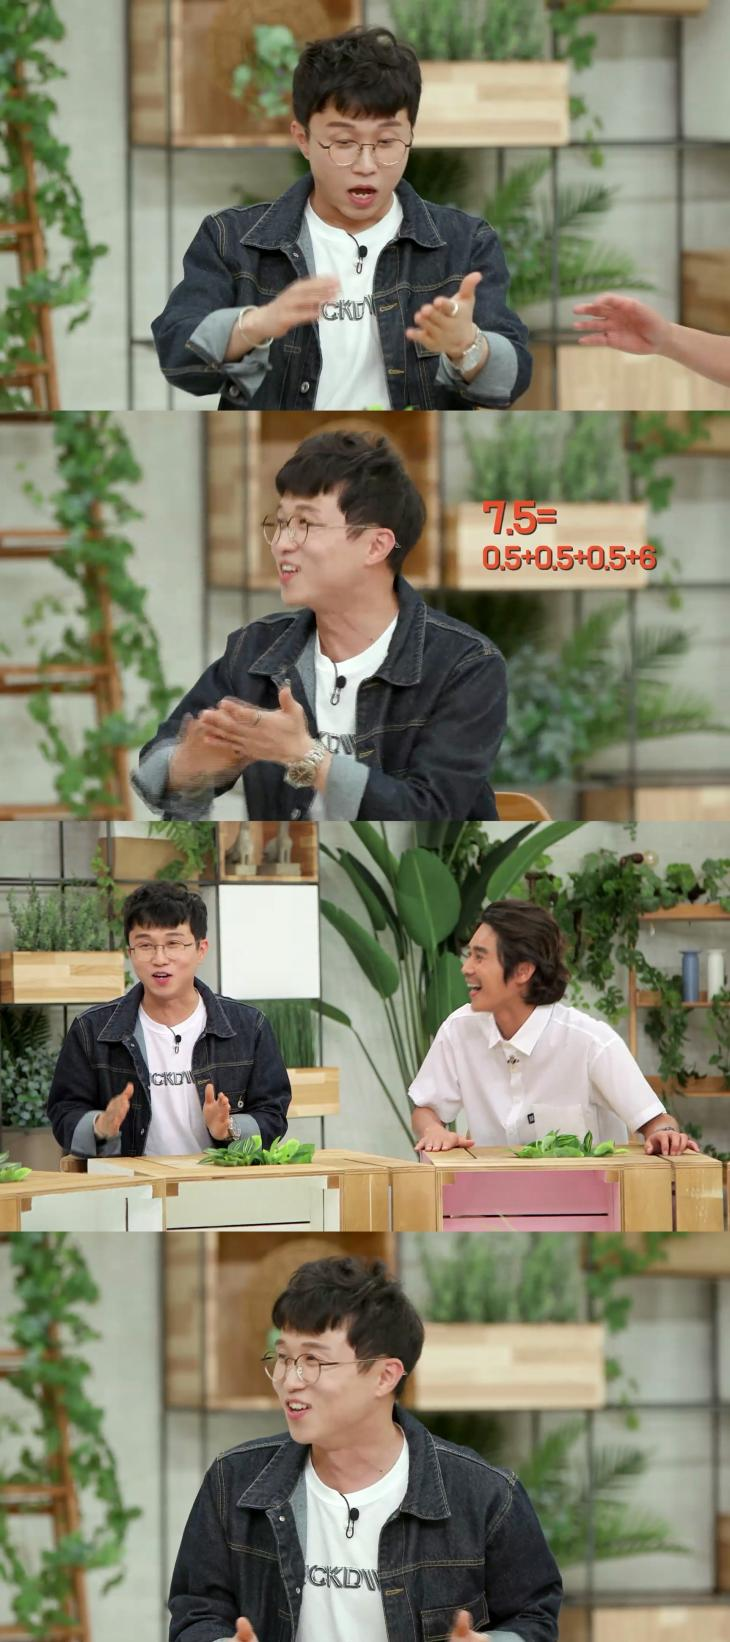 E채널 '내 형제의 연인들: 가족이 보고있다'